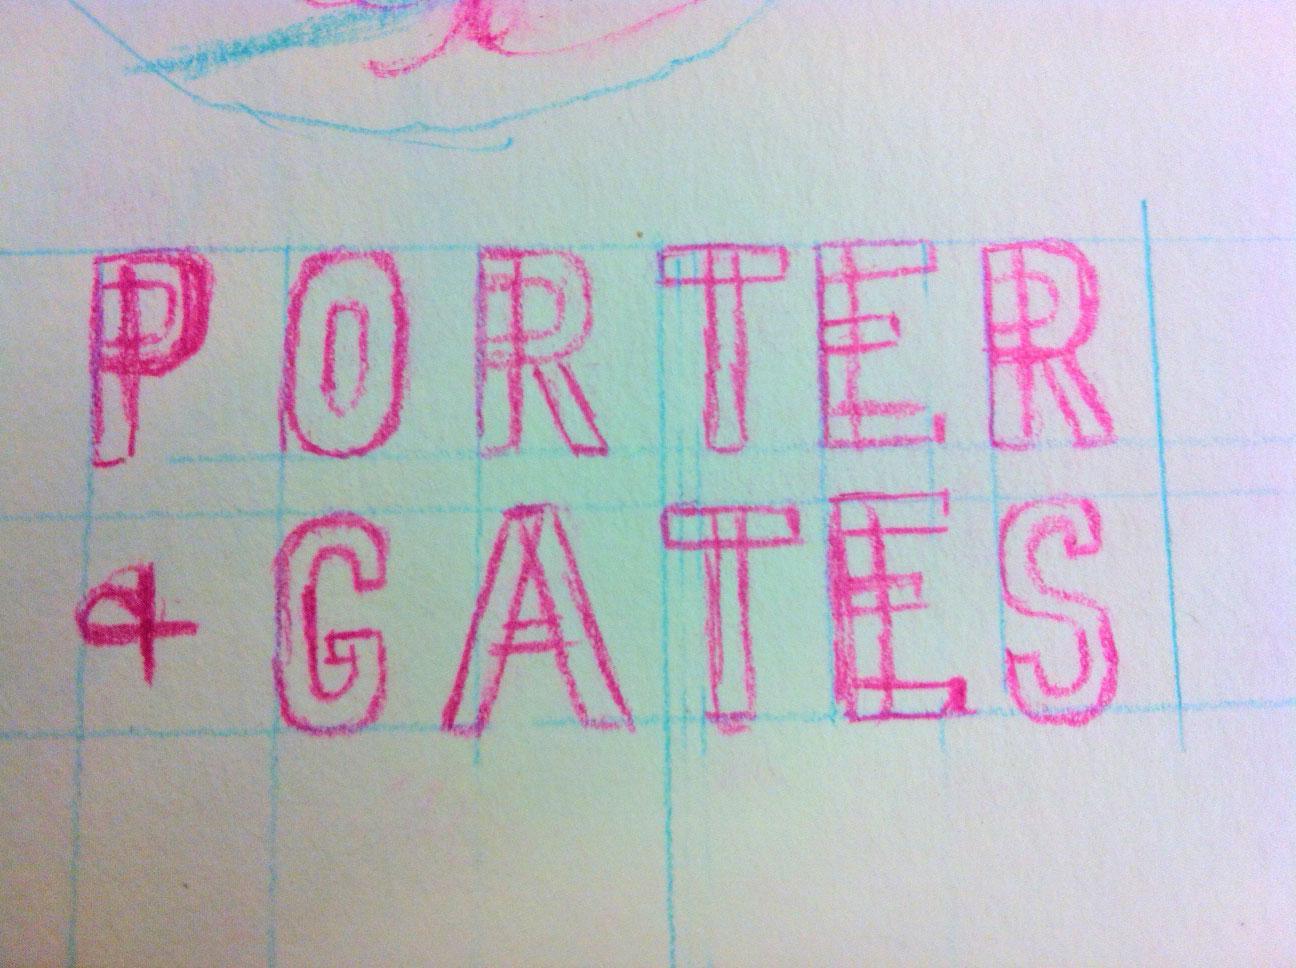 Porter+Gates Logo Sketches - image 2 - student project